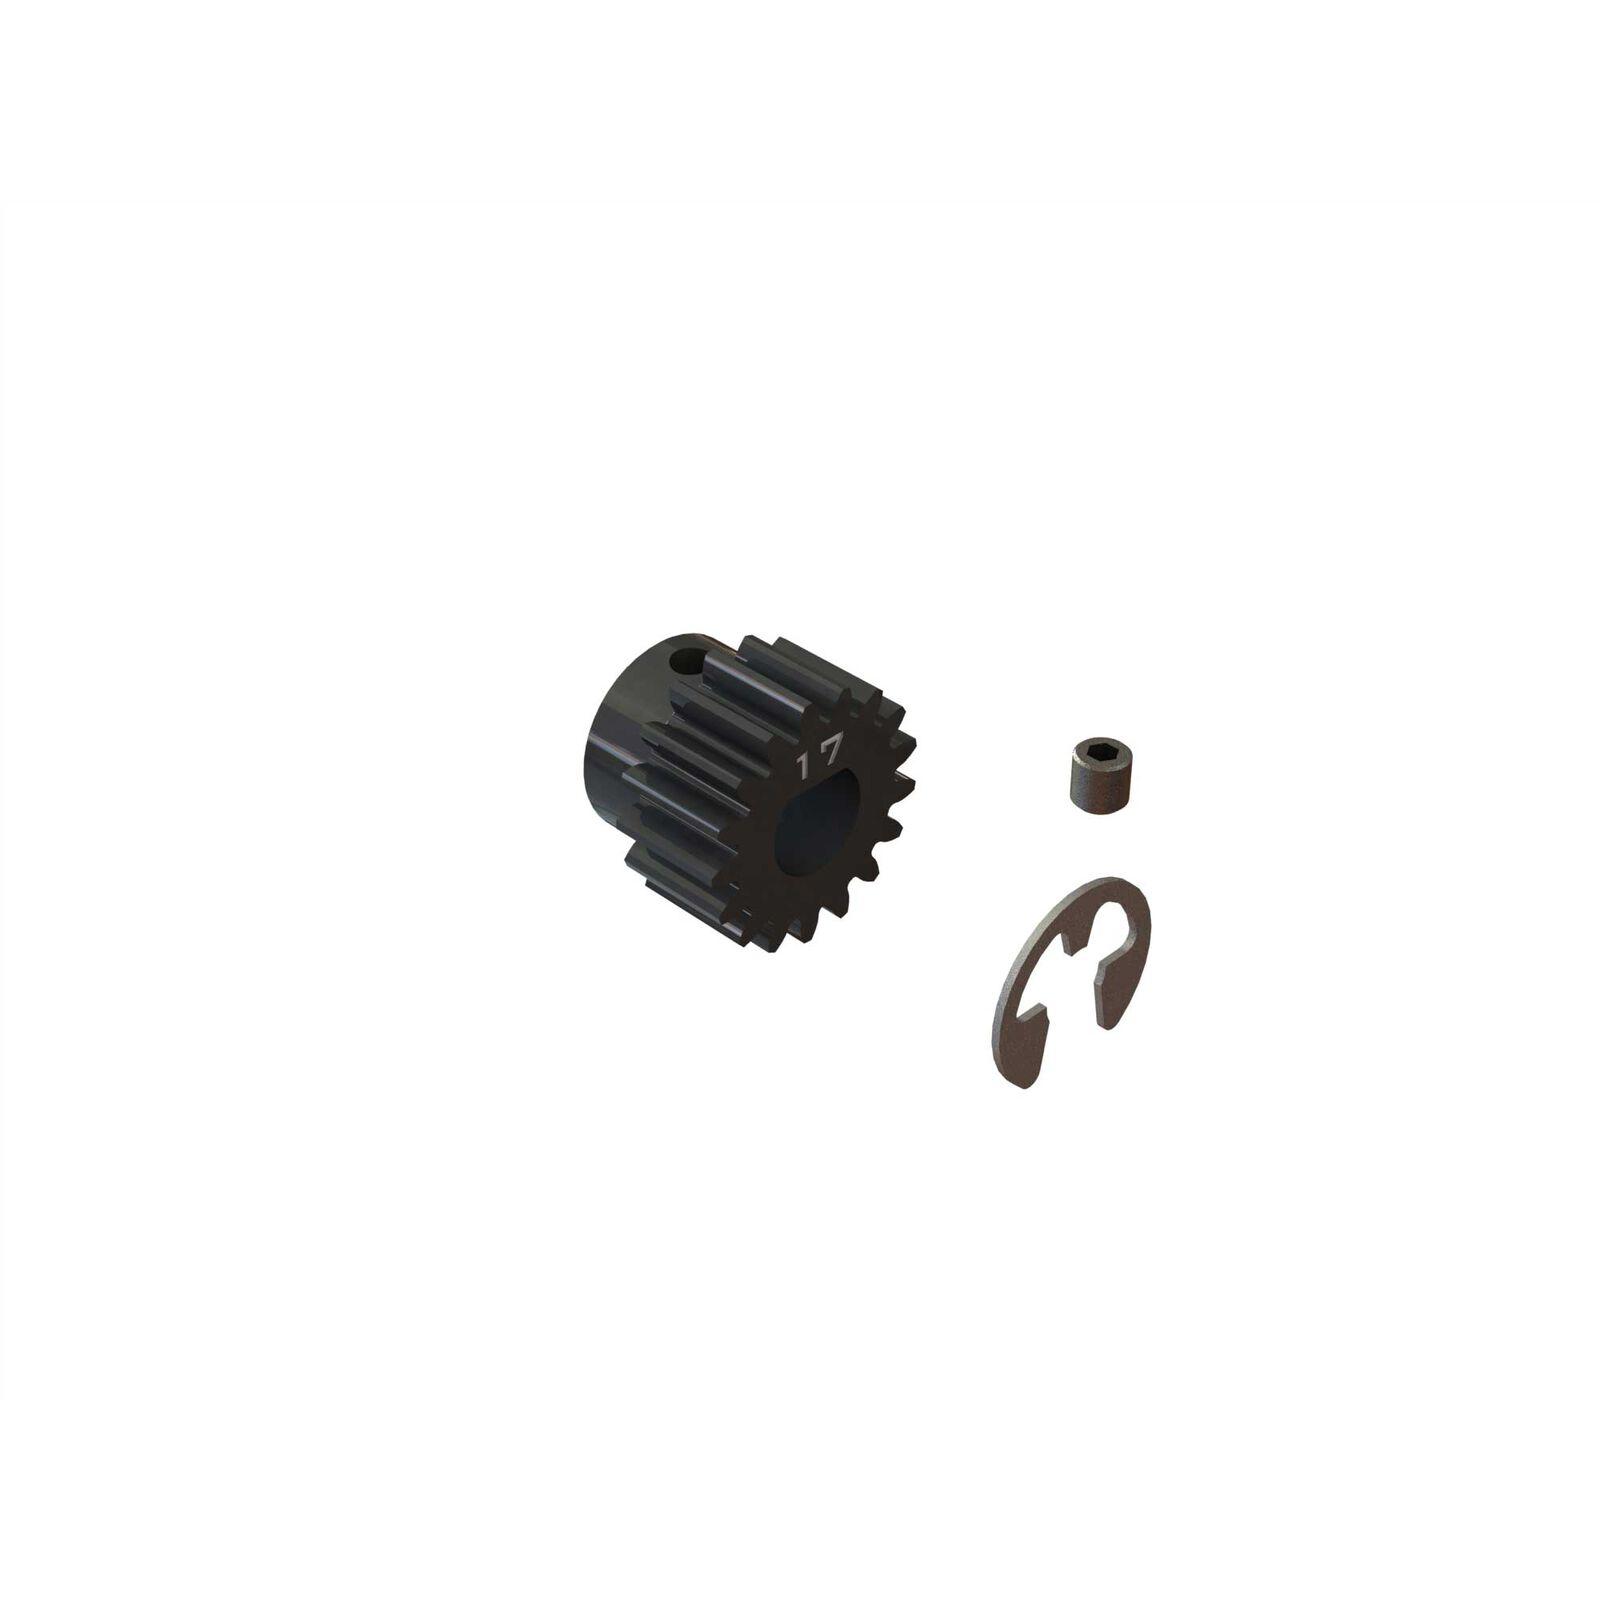 17T Mod1 Safe-D8 Pinion Gear